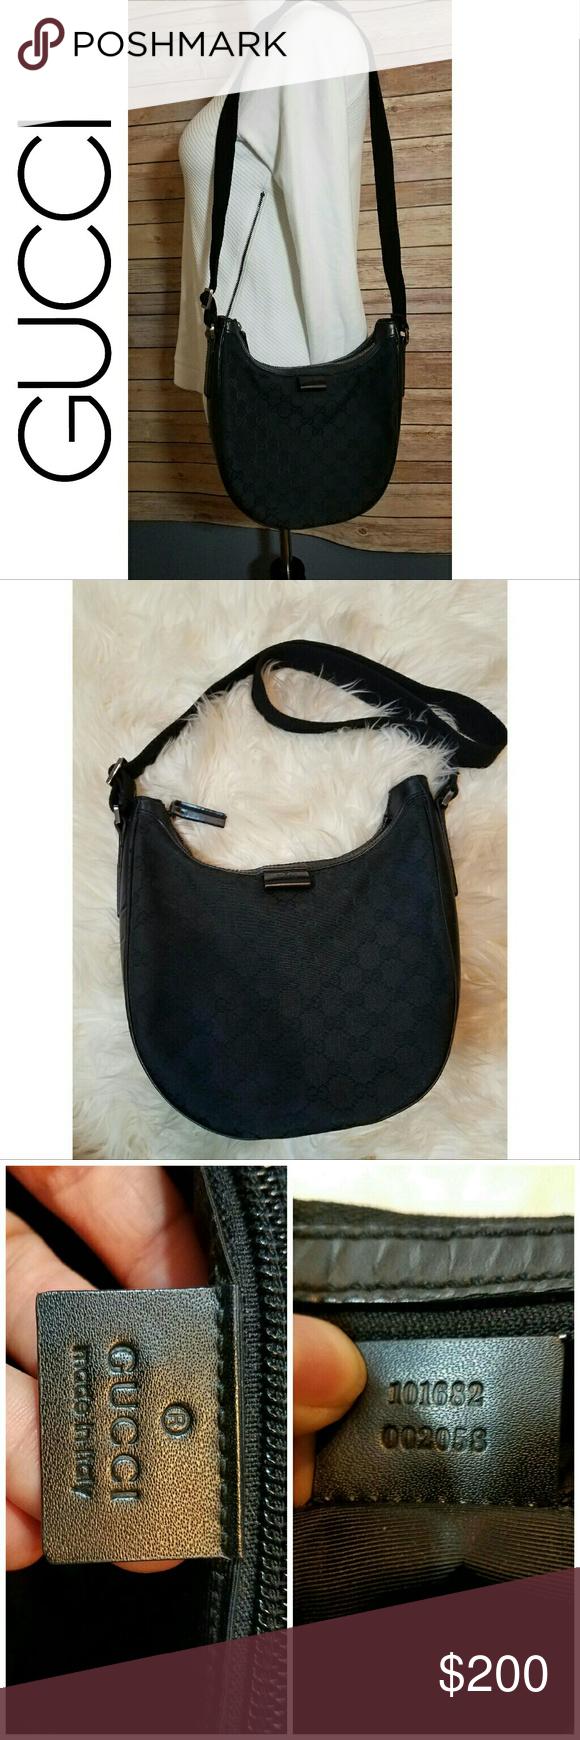 50cb81fae25 GUCCI Vintage GG Black Canvas Crossbody Bag Purse Authentic Vintage GUCCI  black canvas and leather sling